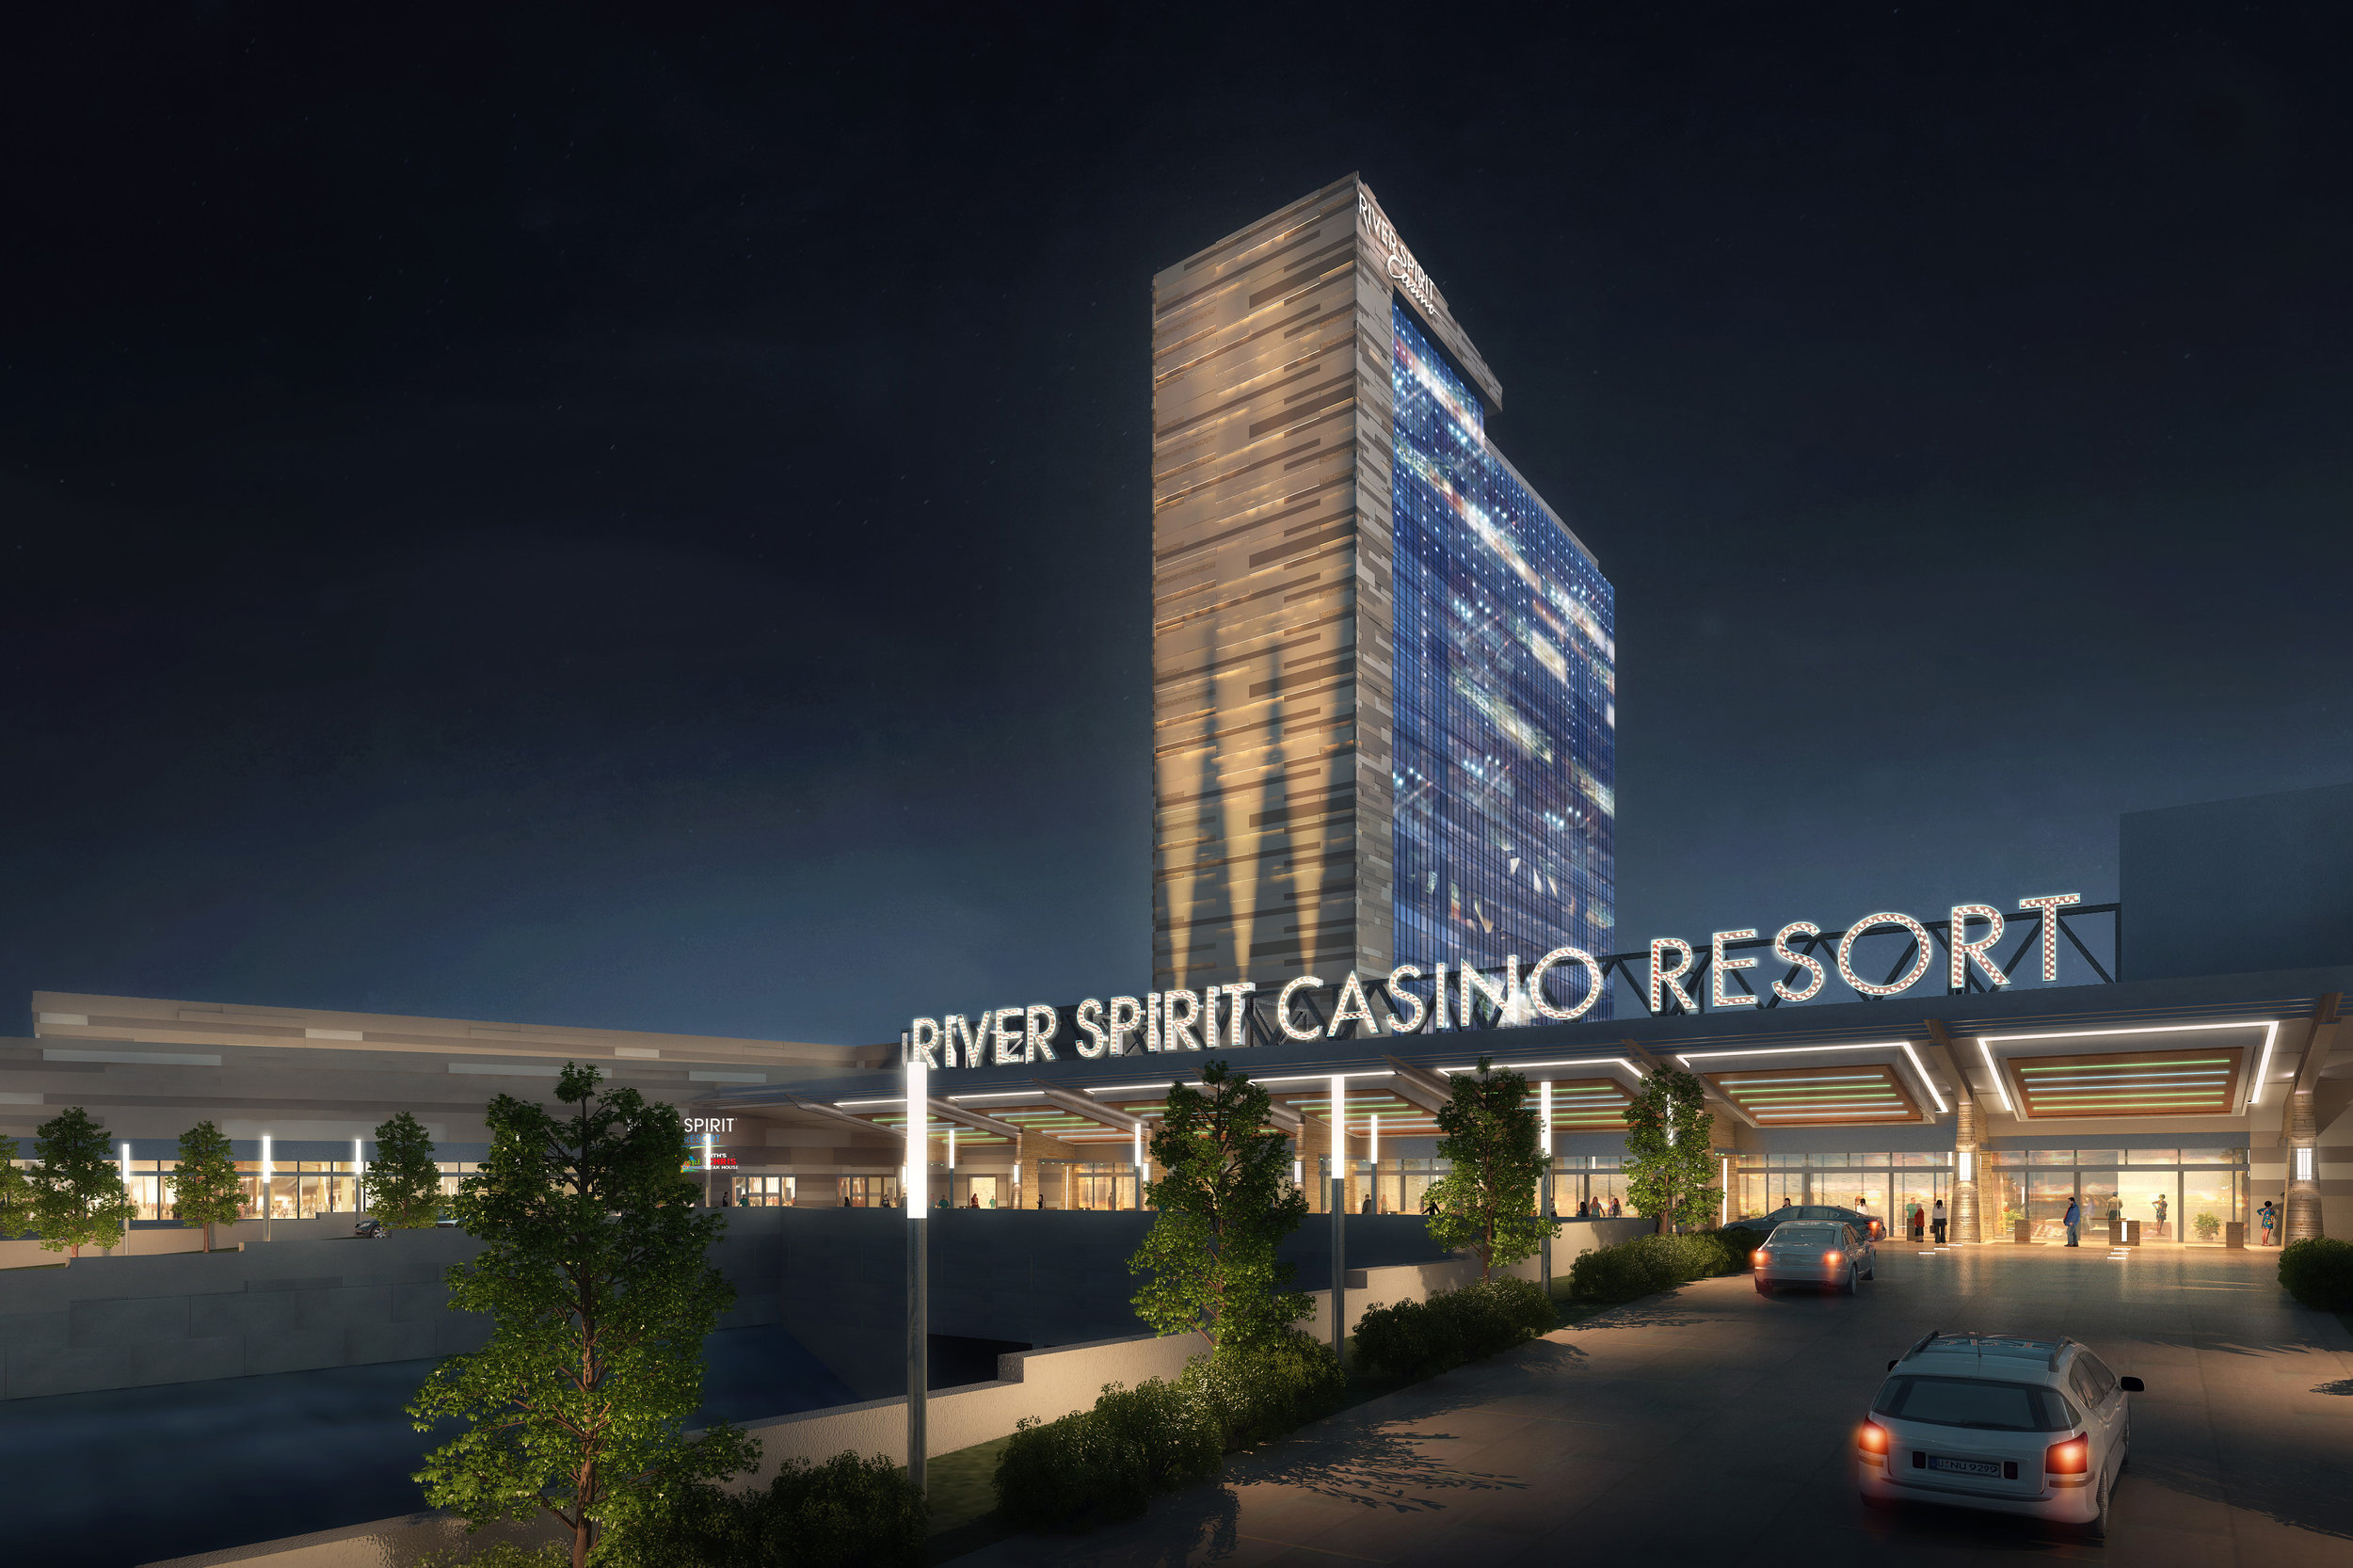 Tulsa, OK   29-Story Hotel - 375,000 SF, Casino - 90,000 SF, Conference - 60,000 SF, Theater - 60,000 SF, Lobby - 60,000 SF = 1.2 Million SF Total   2017